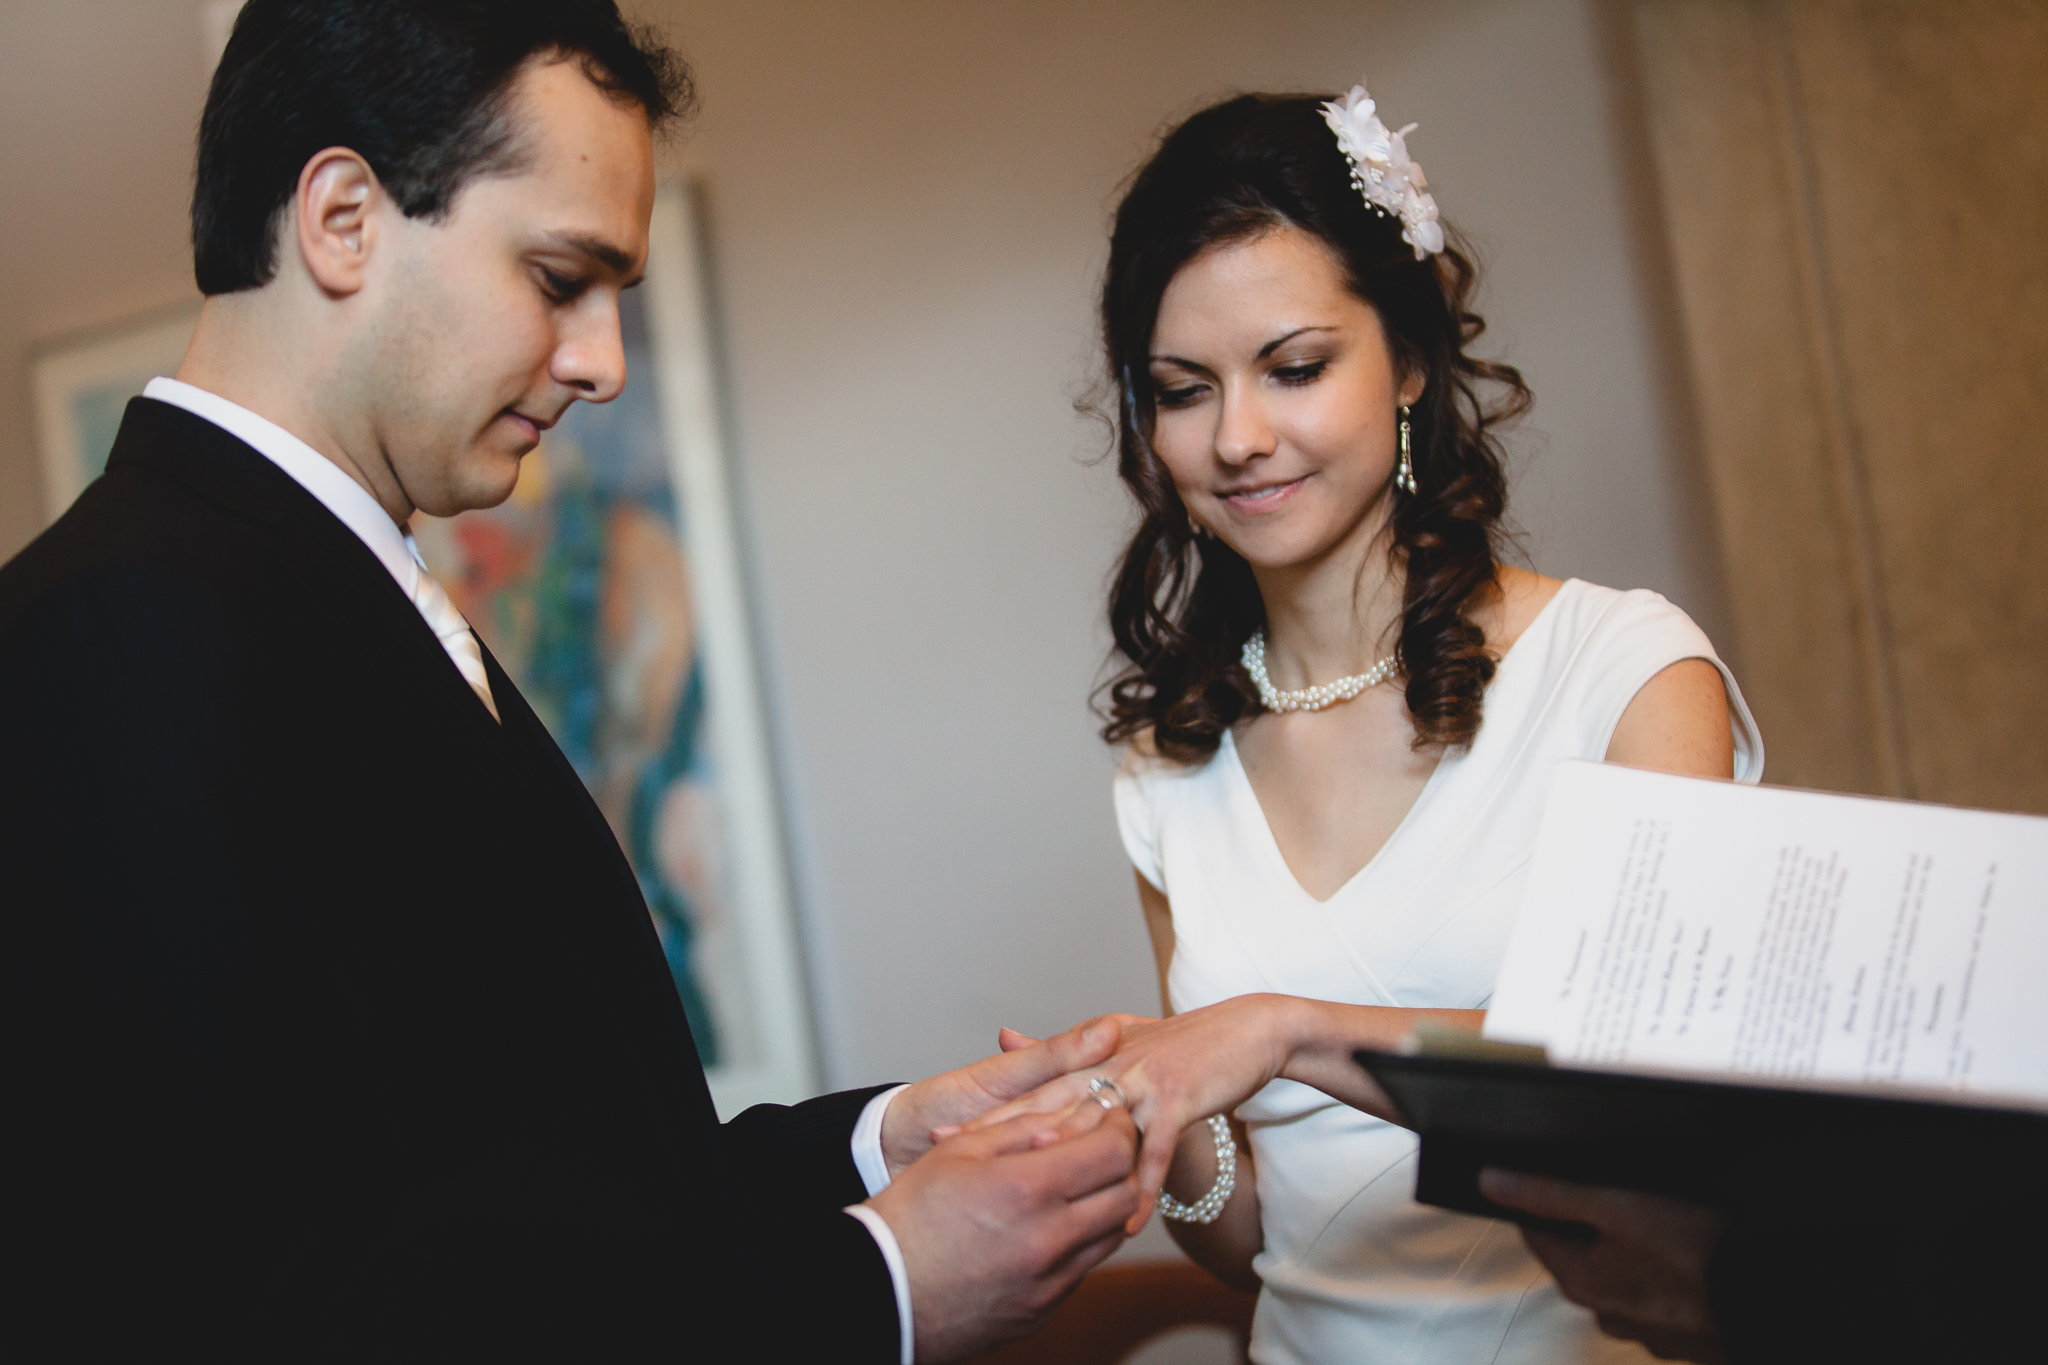 Toronto Wedding Photography - Zoya & Alexei -14.jpg